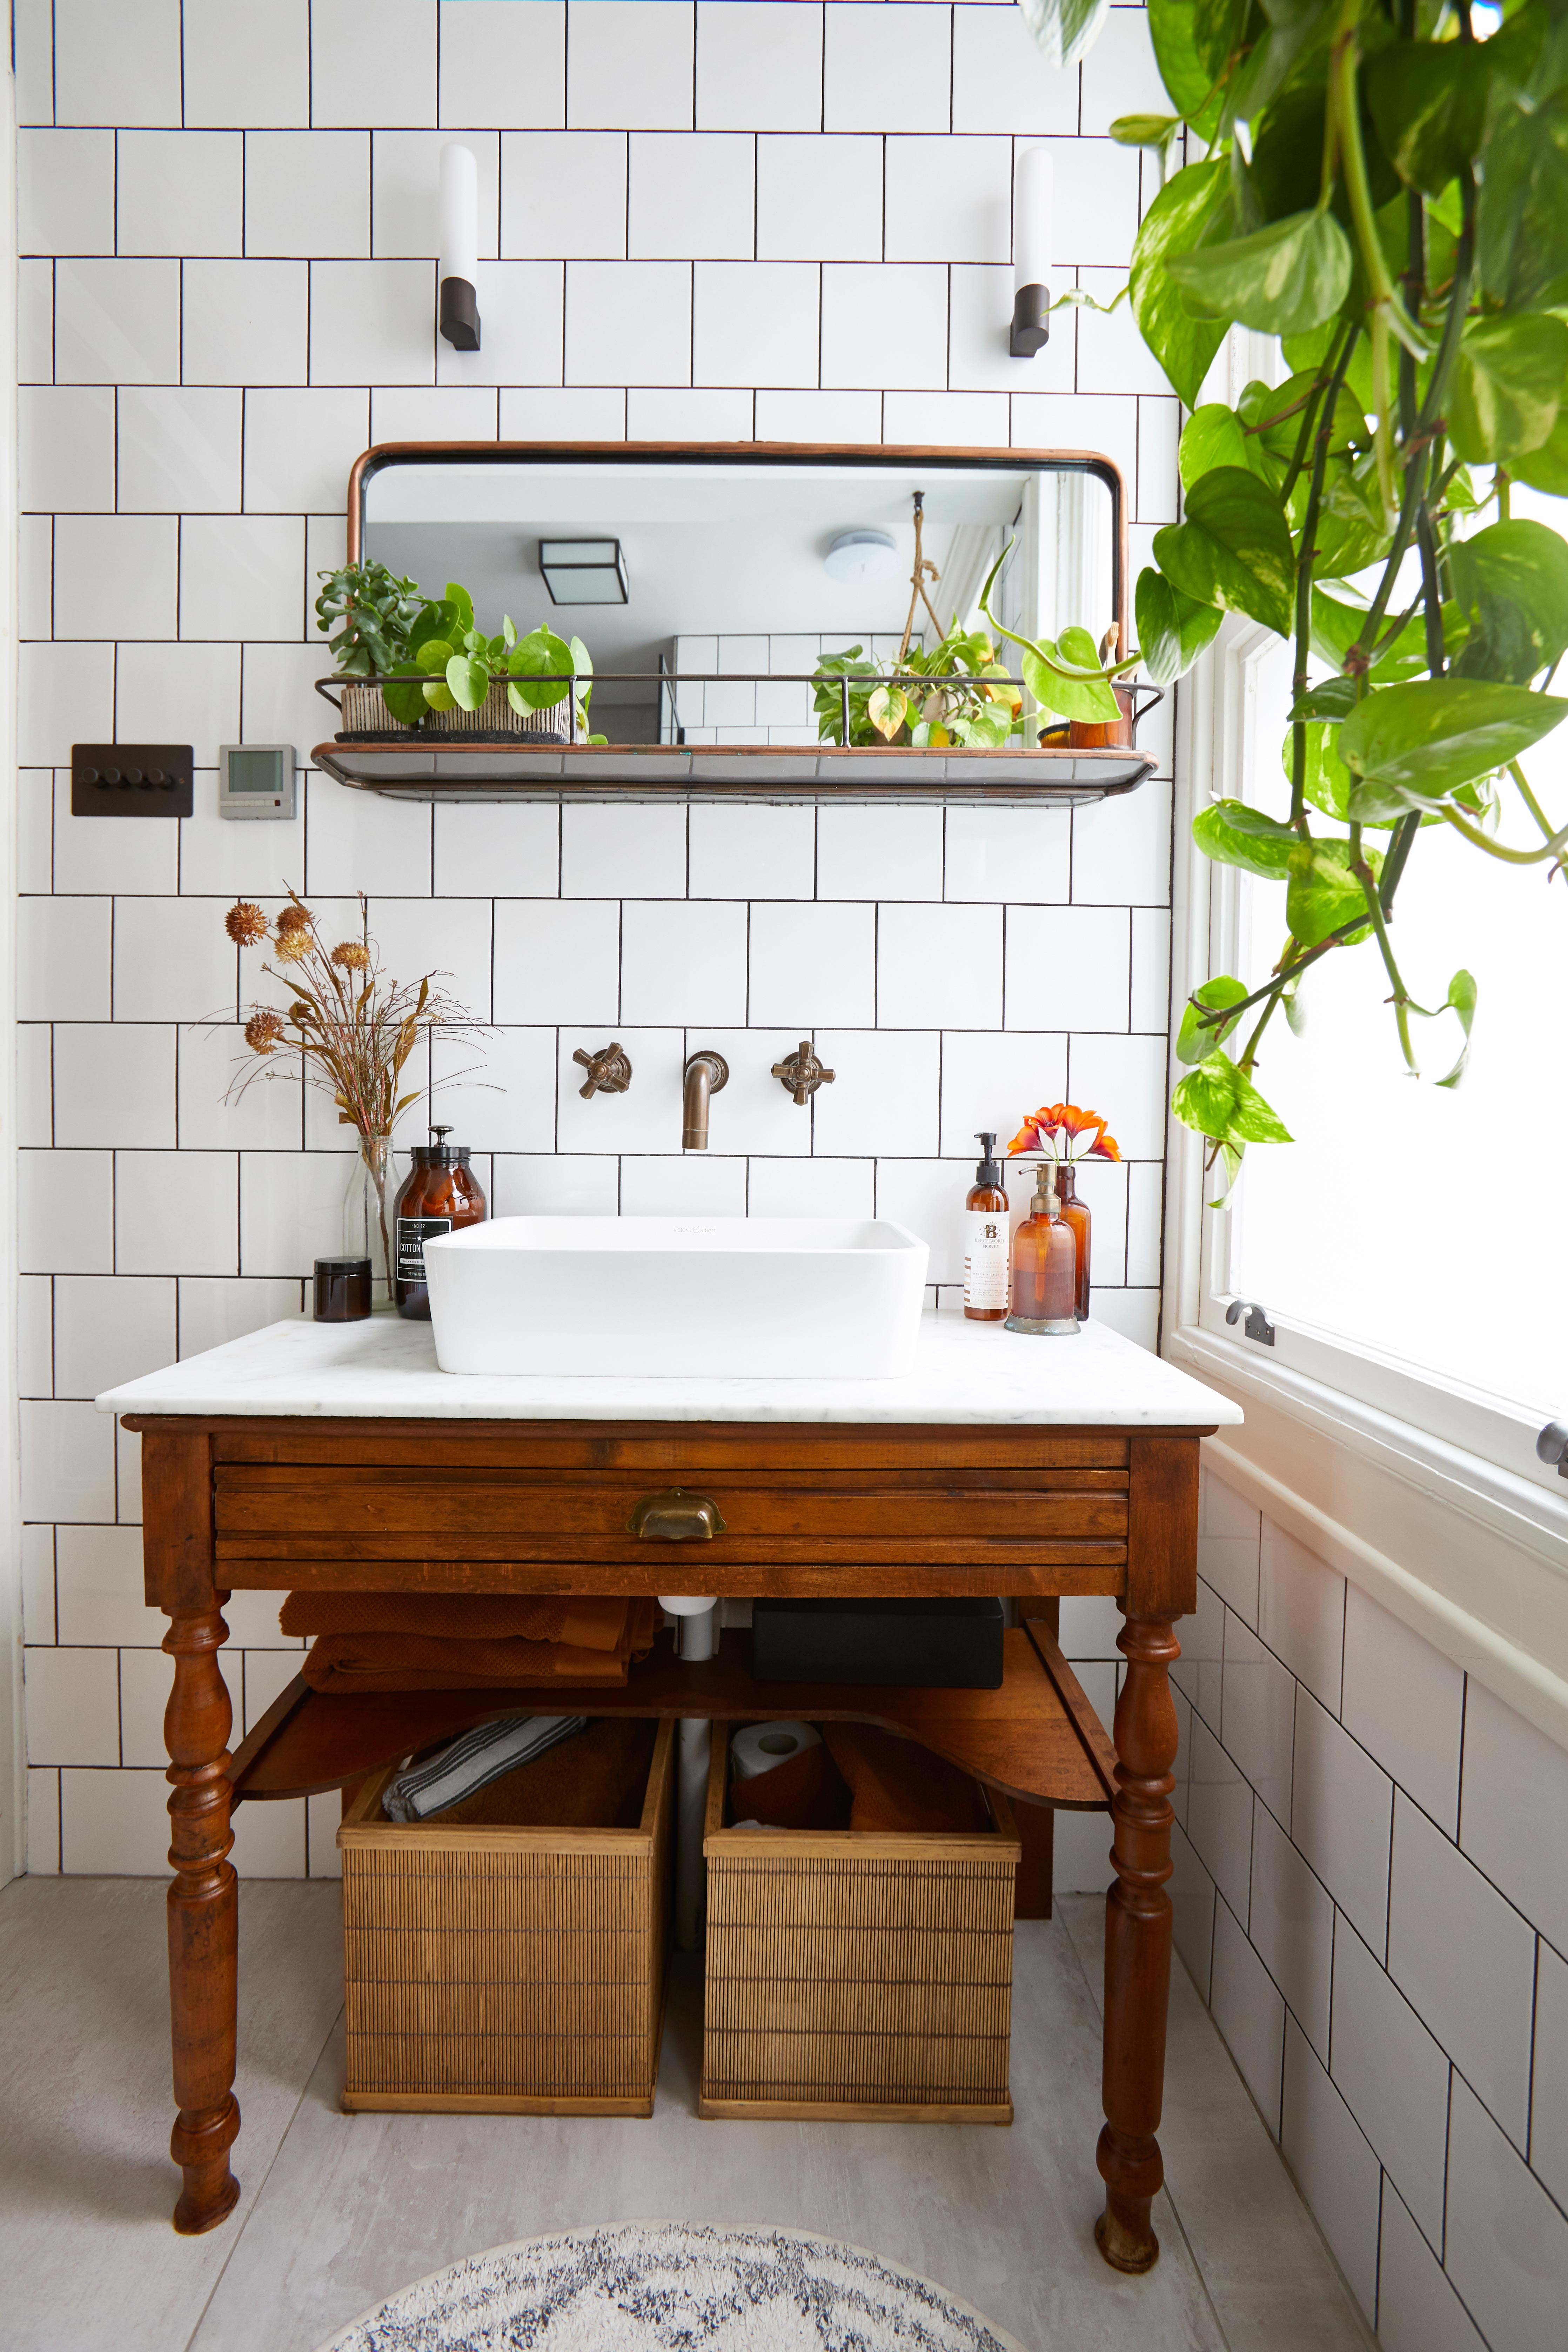 Bathroom Storage Ideas 29 Sleek, Wicker Bathroom Shelving Units